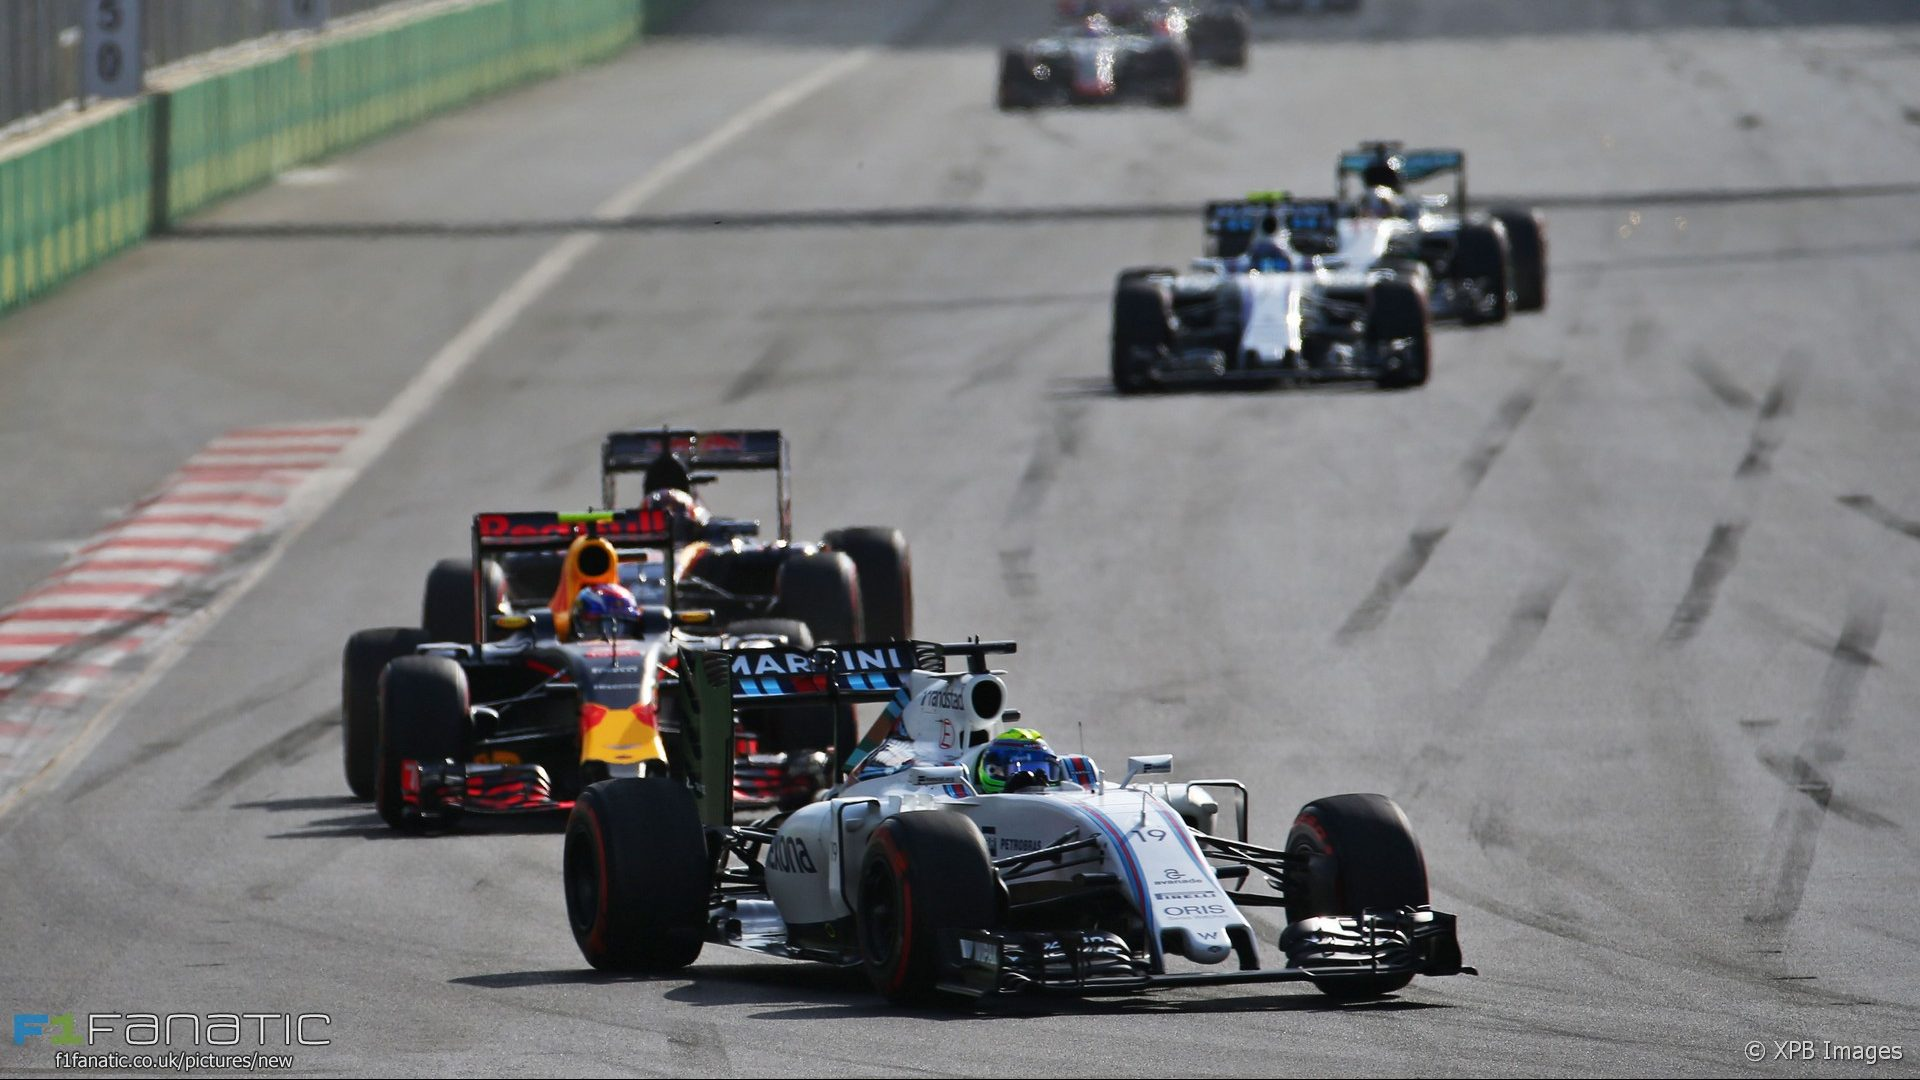 Felipe Massa, Williams, Baku City Circuit, 2016